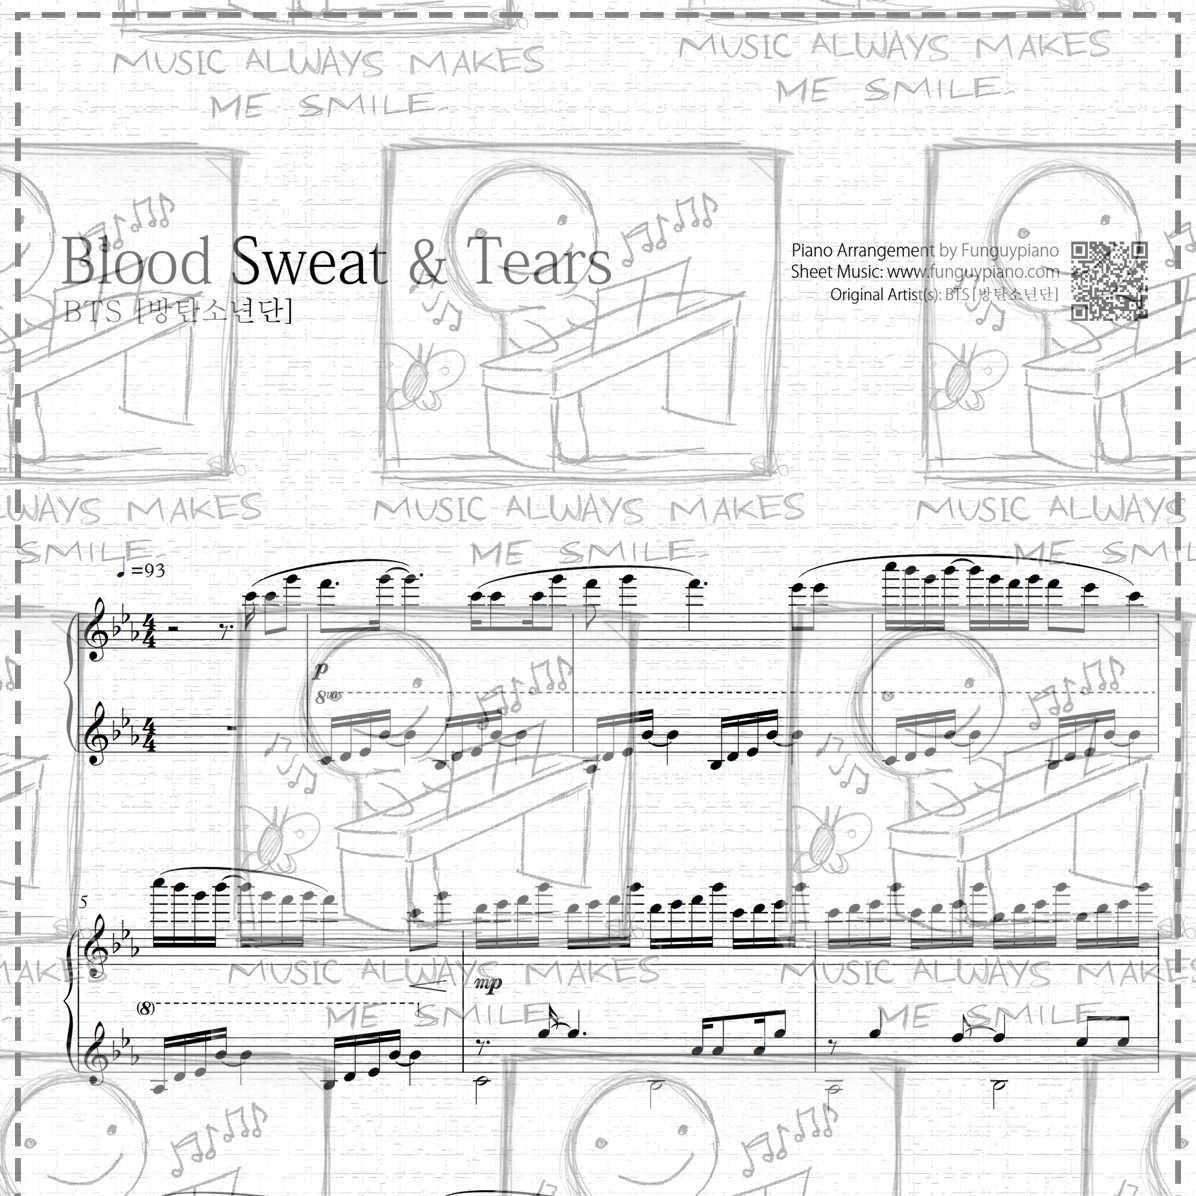 Piano Sheet Music Midi: Blood Sweat & Tears [ Sheet Music / Midi / Mp3